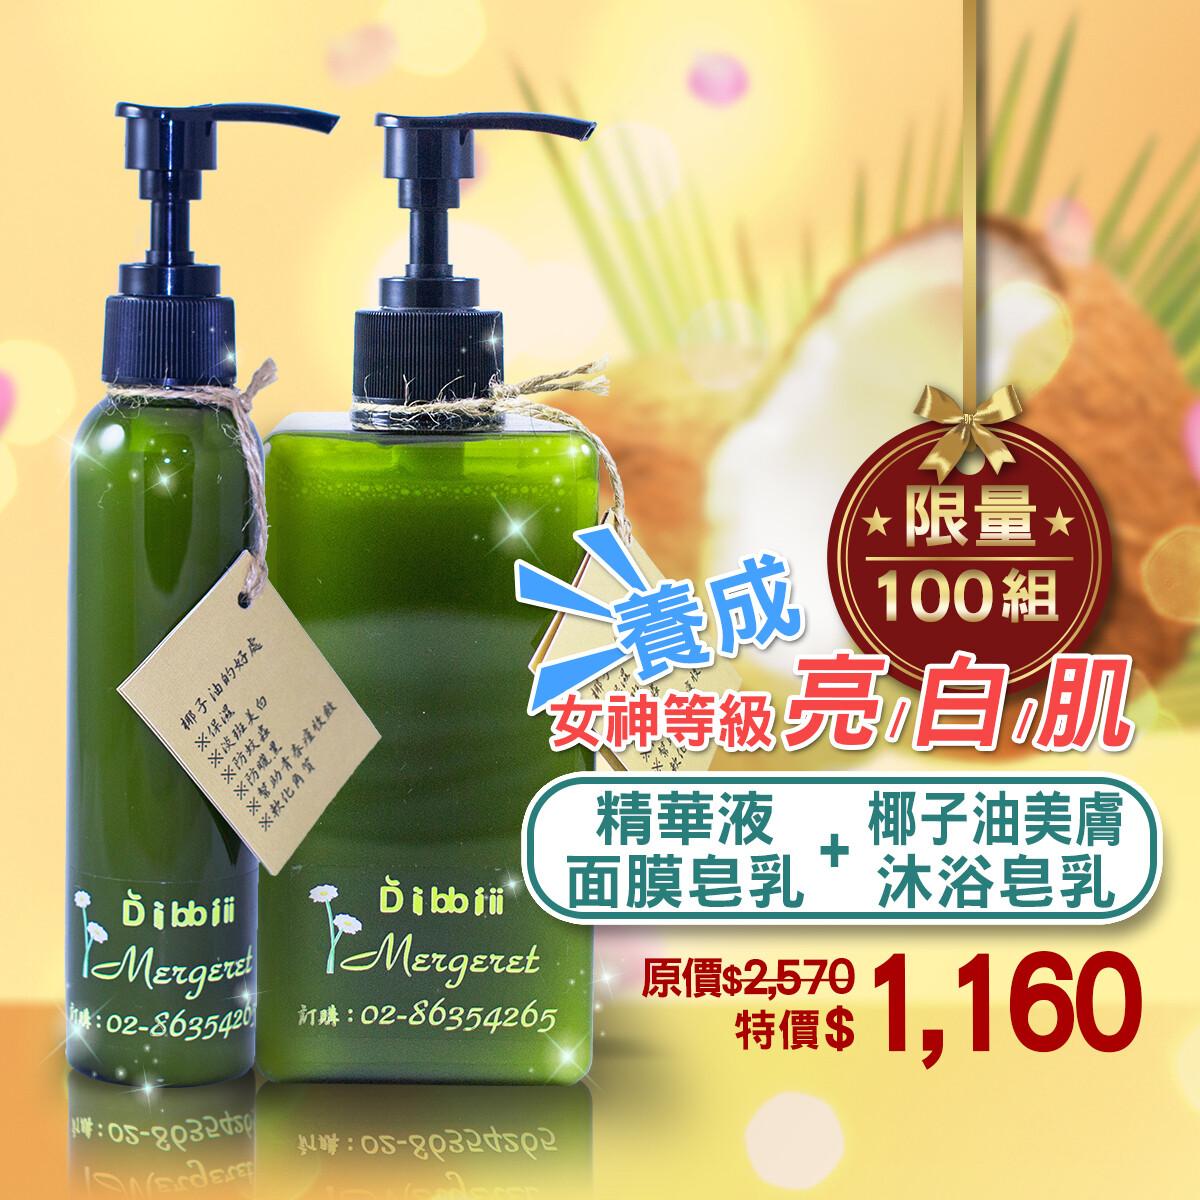 Diibbiiii椰子油美膚皂乳 - 限量組合:精華液面膜皂乳(150ml)+美膚沐浴皂乳(500ml) - 活動特惠$1160